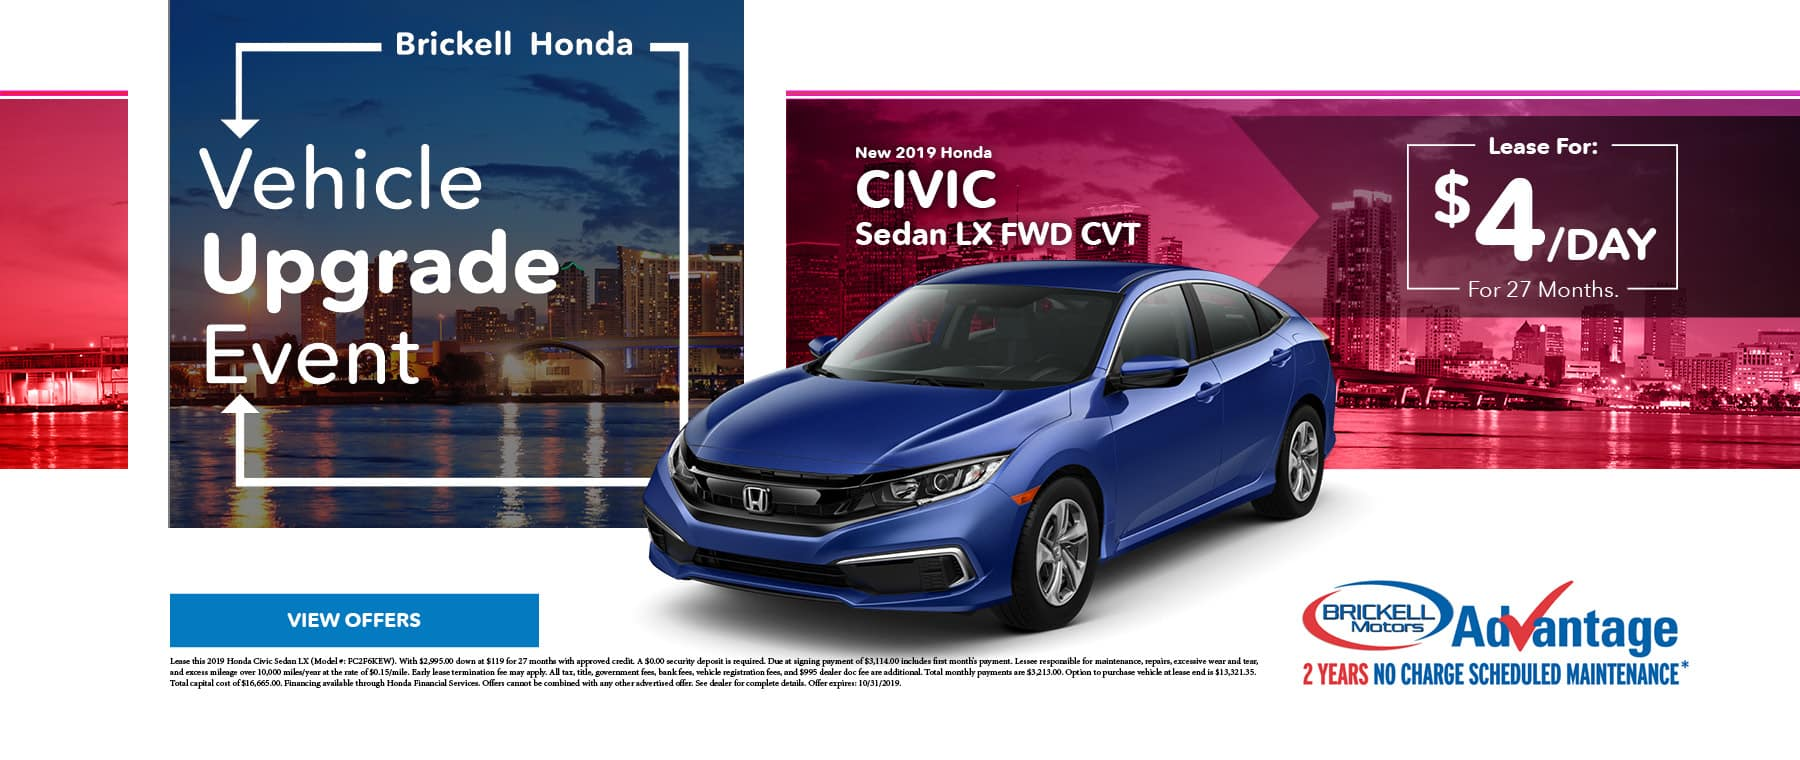 Brickell Honda Civic Sale